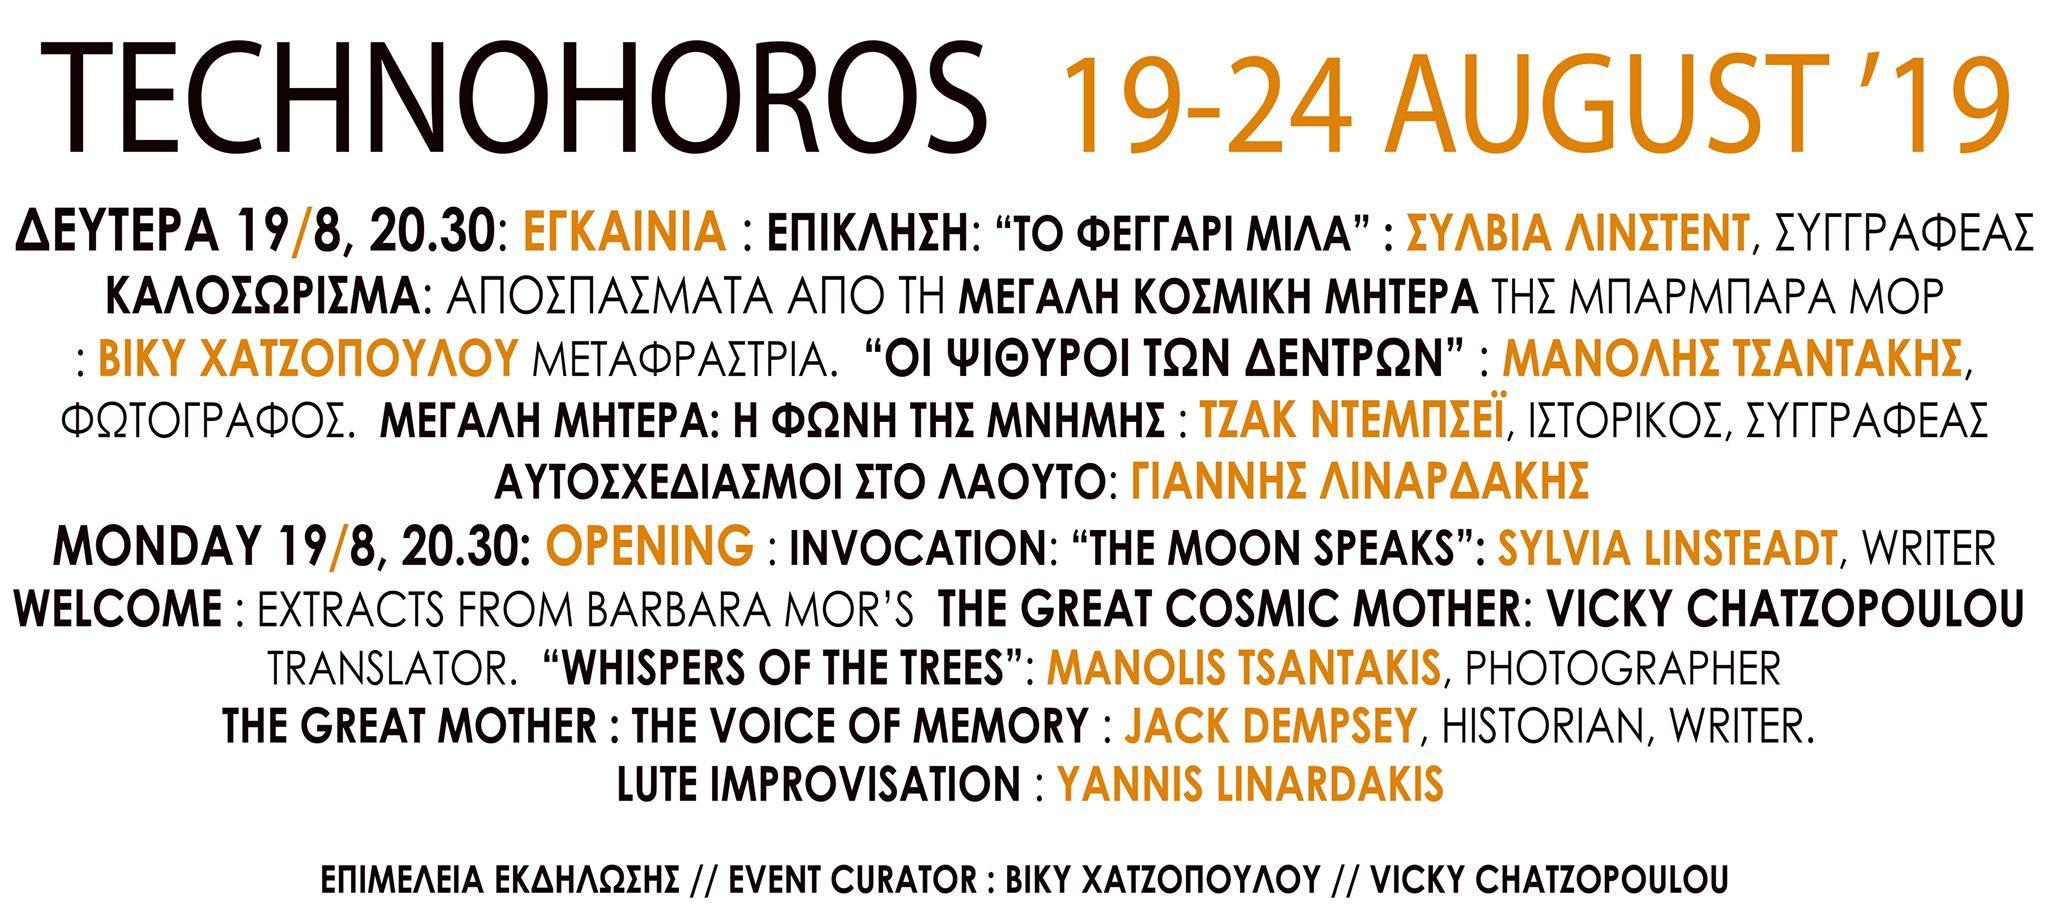 Kadiani Sitia event flyer Aug 19 2019